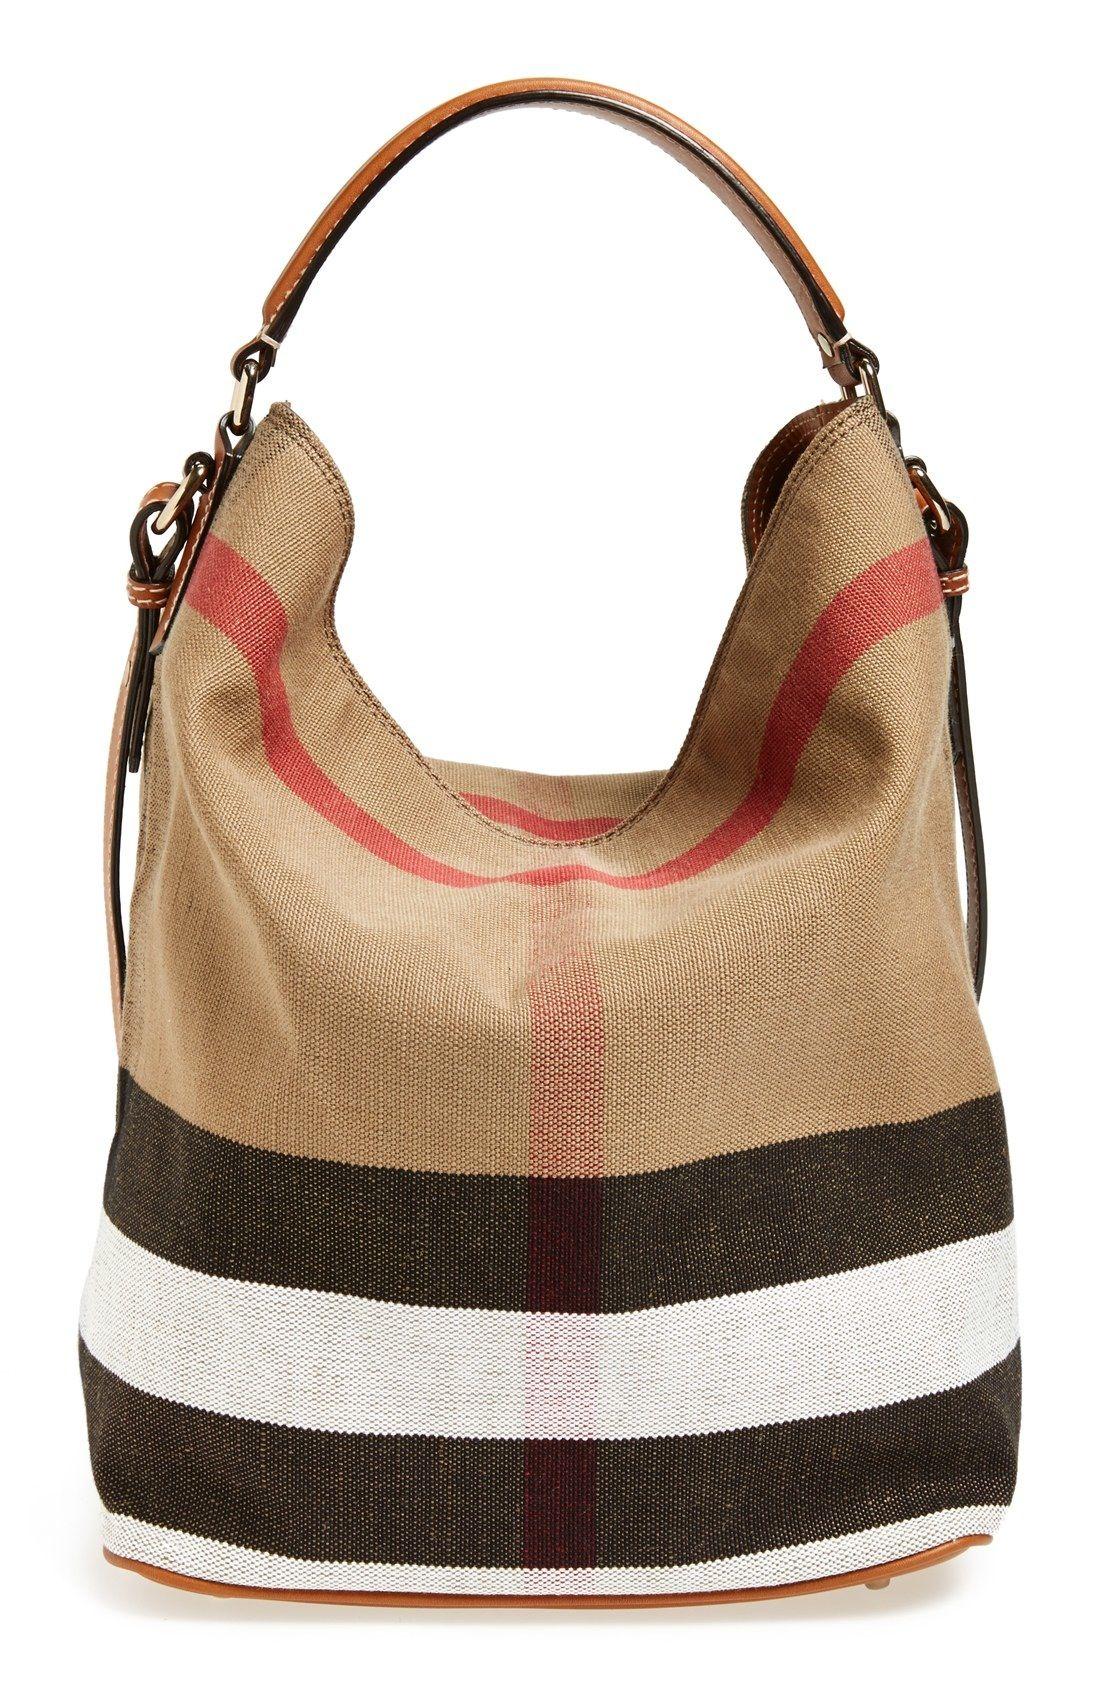 8cb1c69f7961 Burberry Brit  Medium Susanna  Check Print Bucket Bag available at   Nordstrom